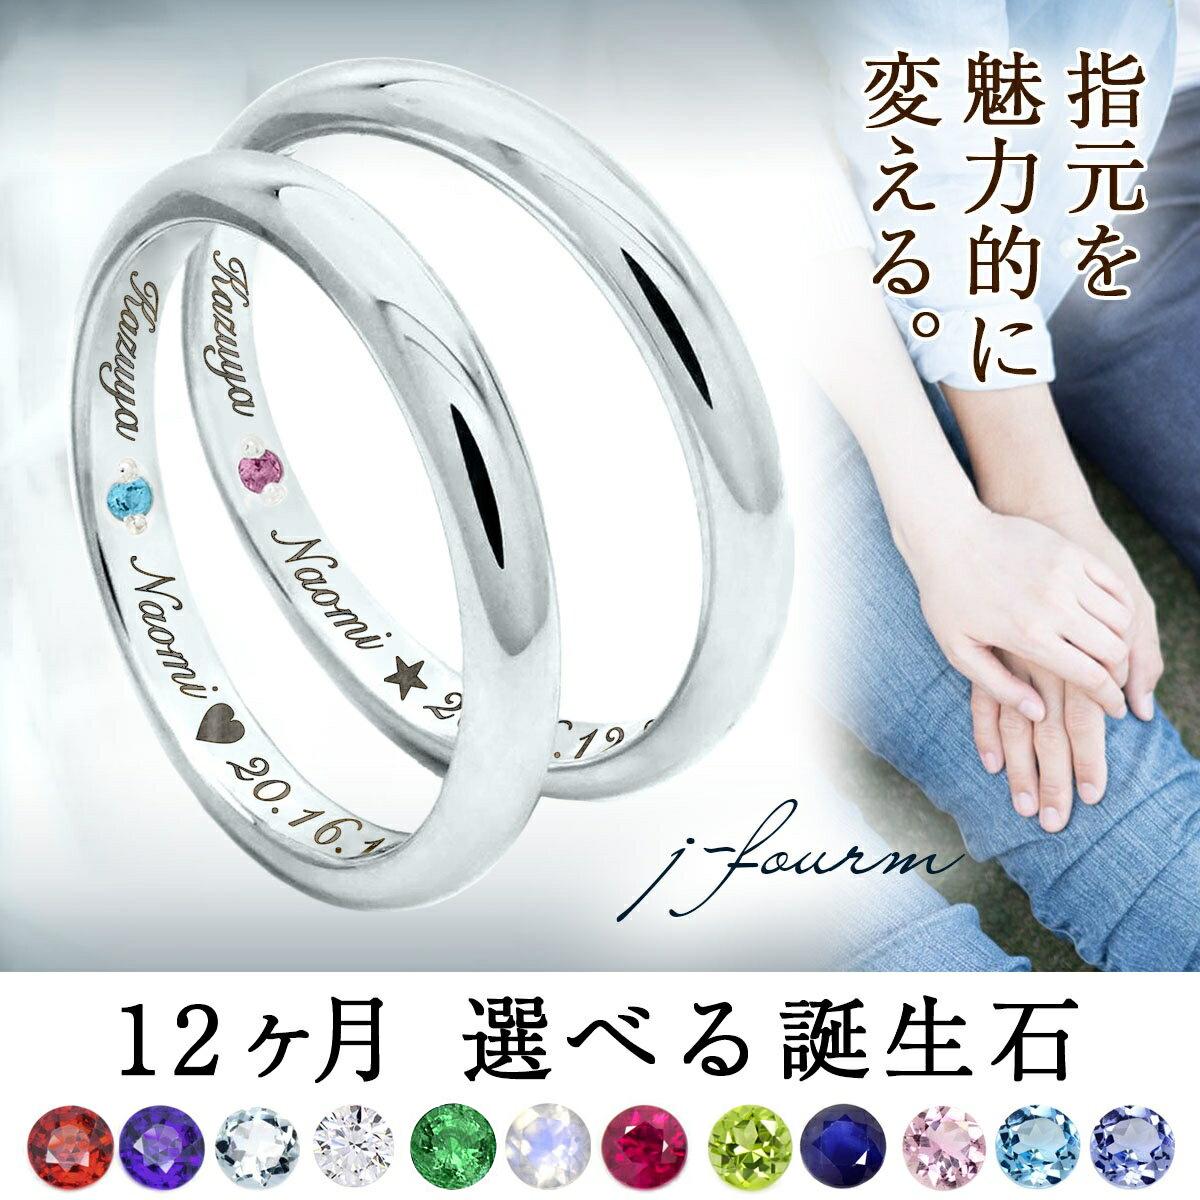 j-forme/ジェイ・フォーム シンプル ペアリング